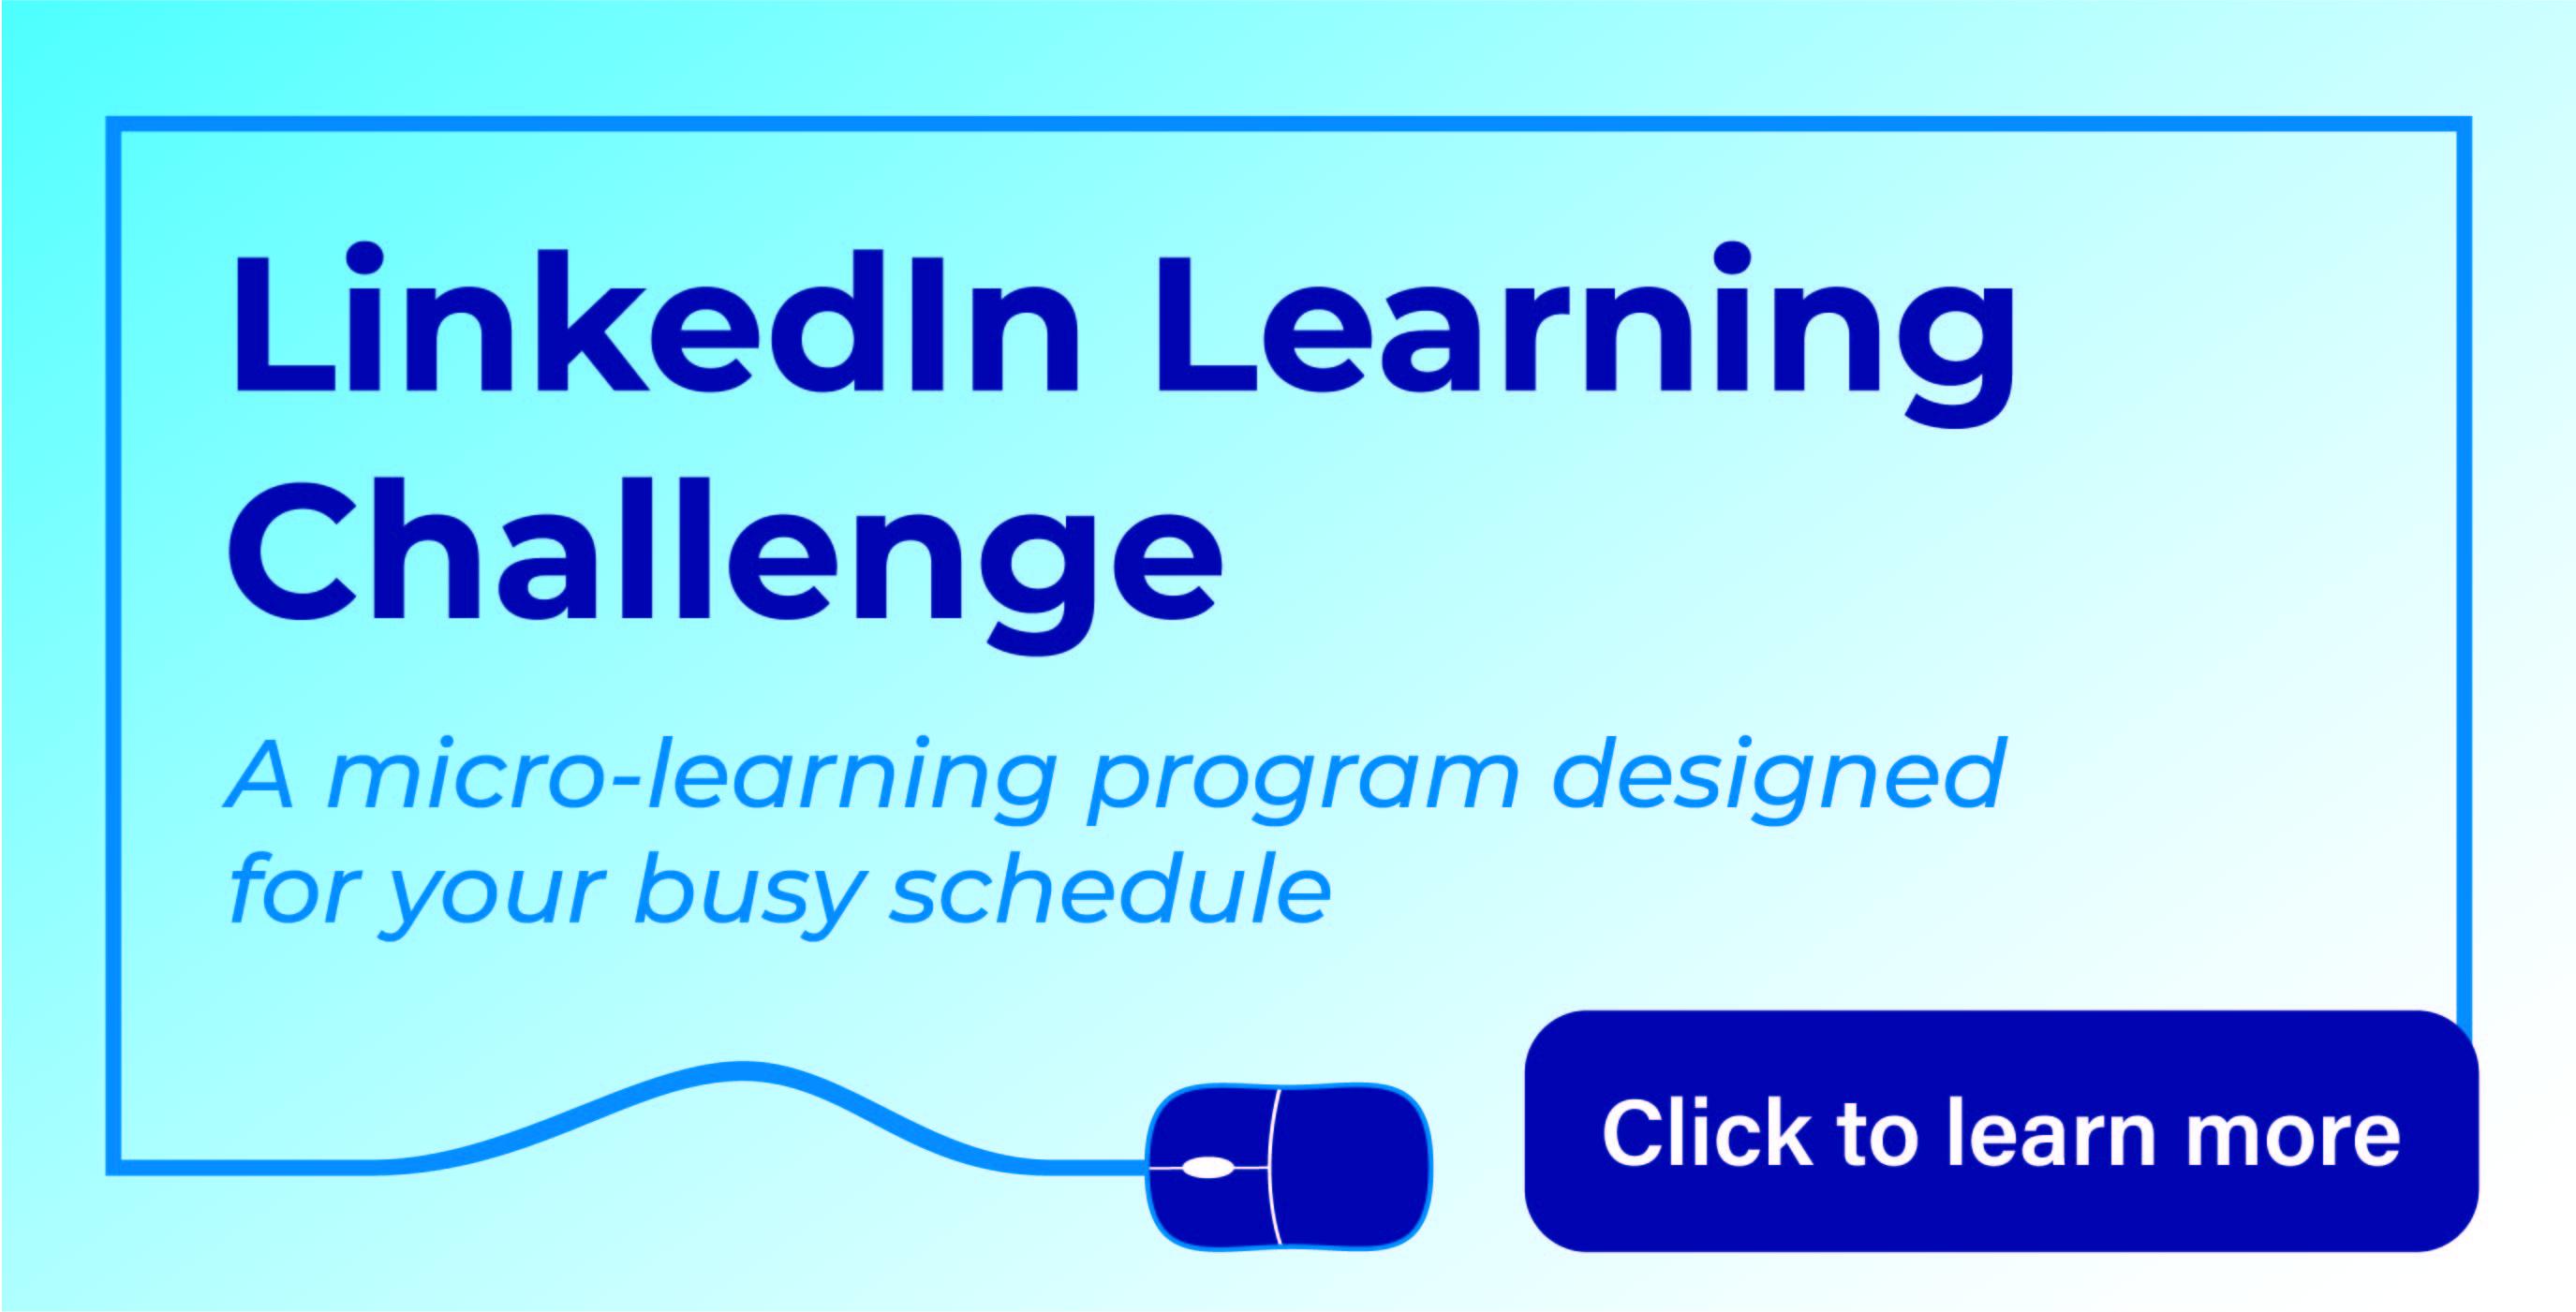 LinkedIn Learning Challenge